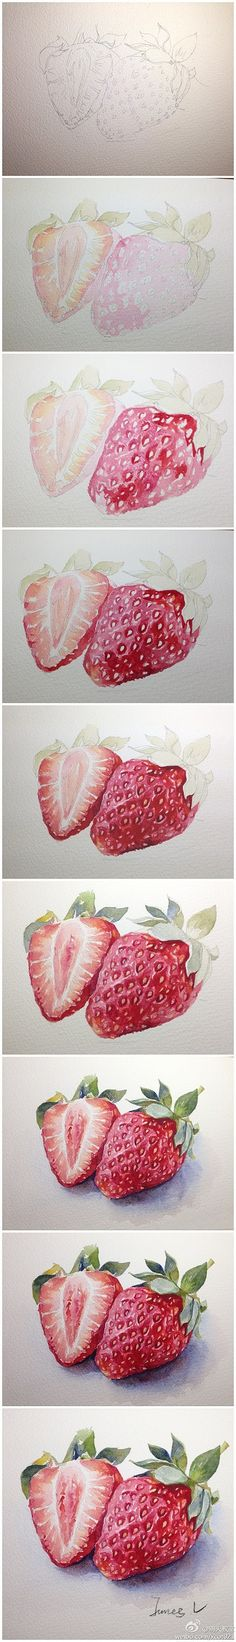 Drawn strawberry watercolor  【绘画教程 Watercolor step Technique